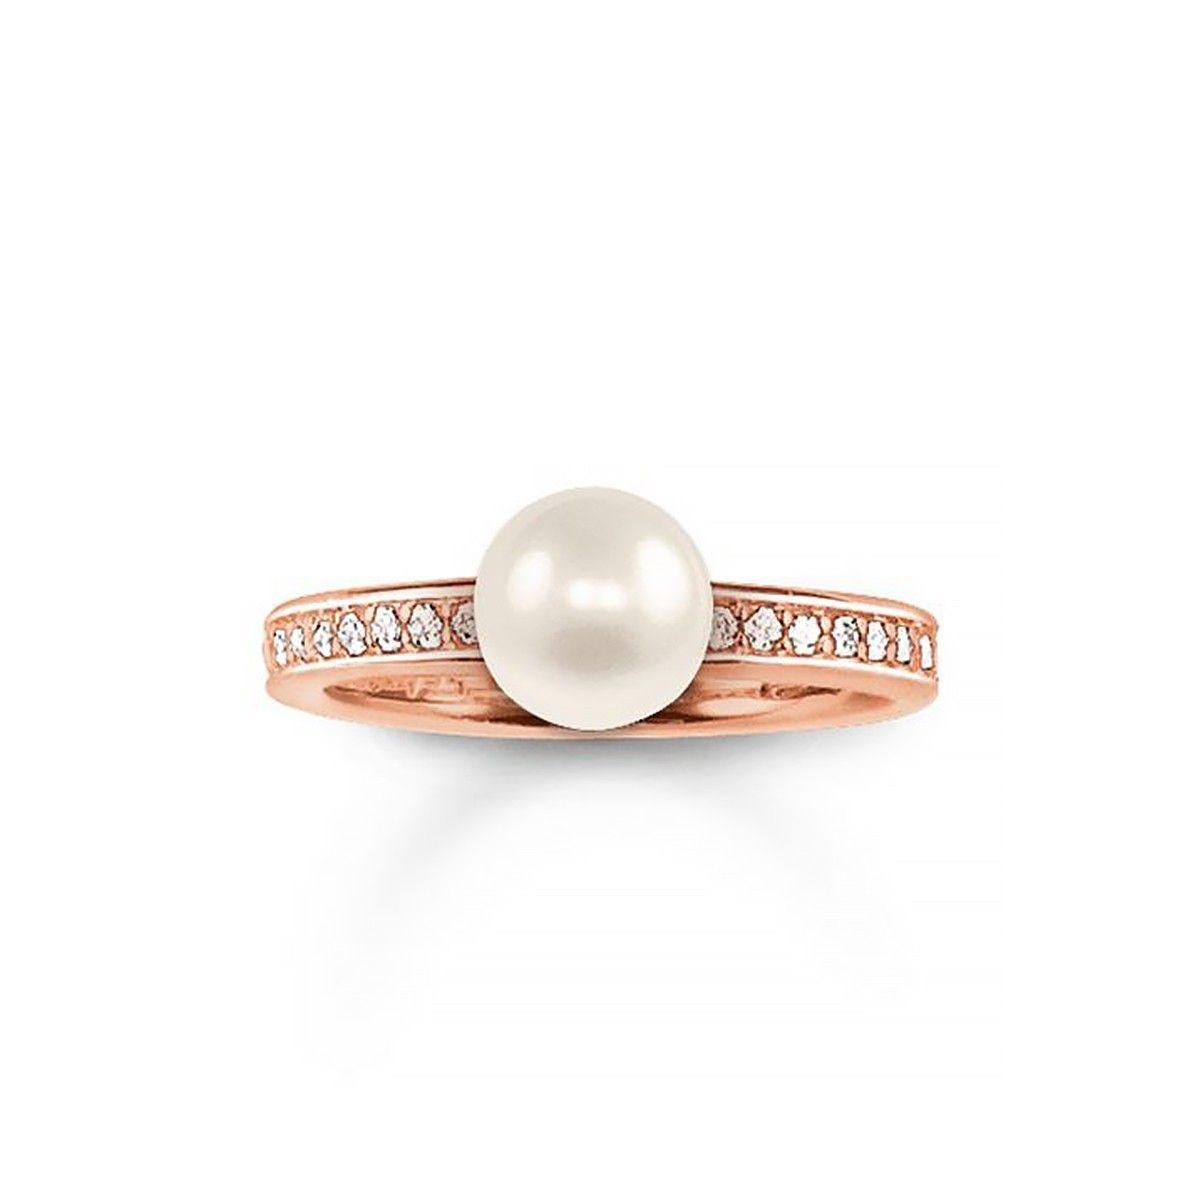 Thomas Sabo Thomas Sabo Designers Womens Jewelry Rings Thomas Sabo Rose Gold Plated Ring